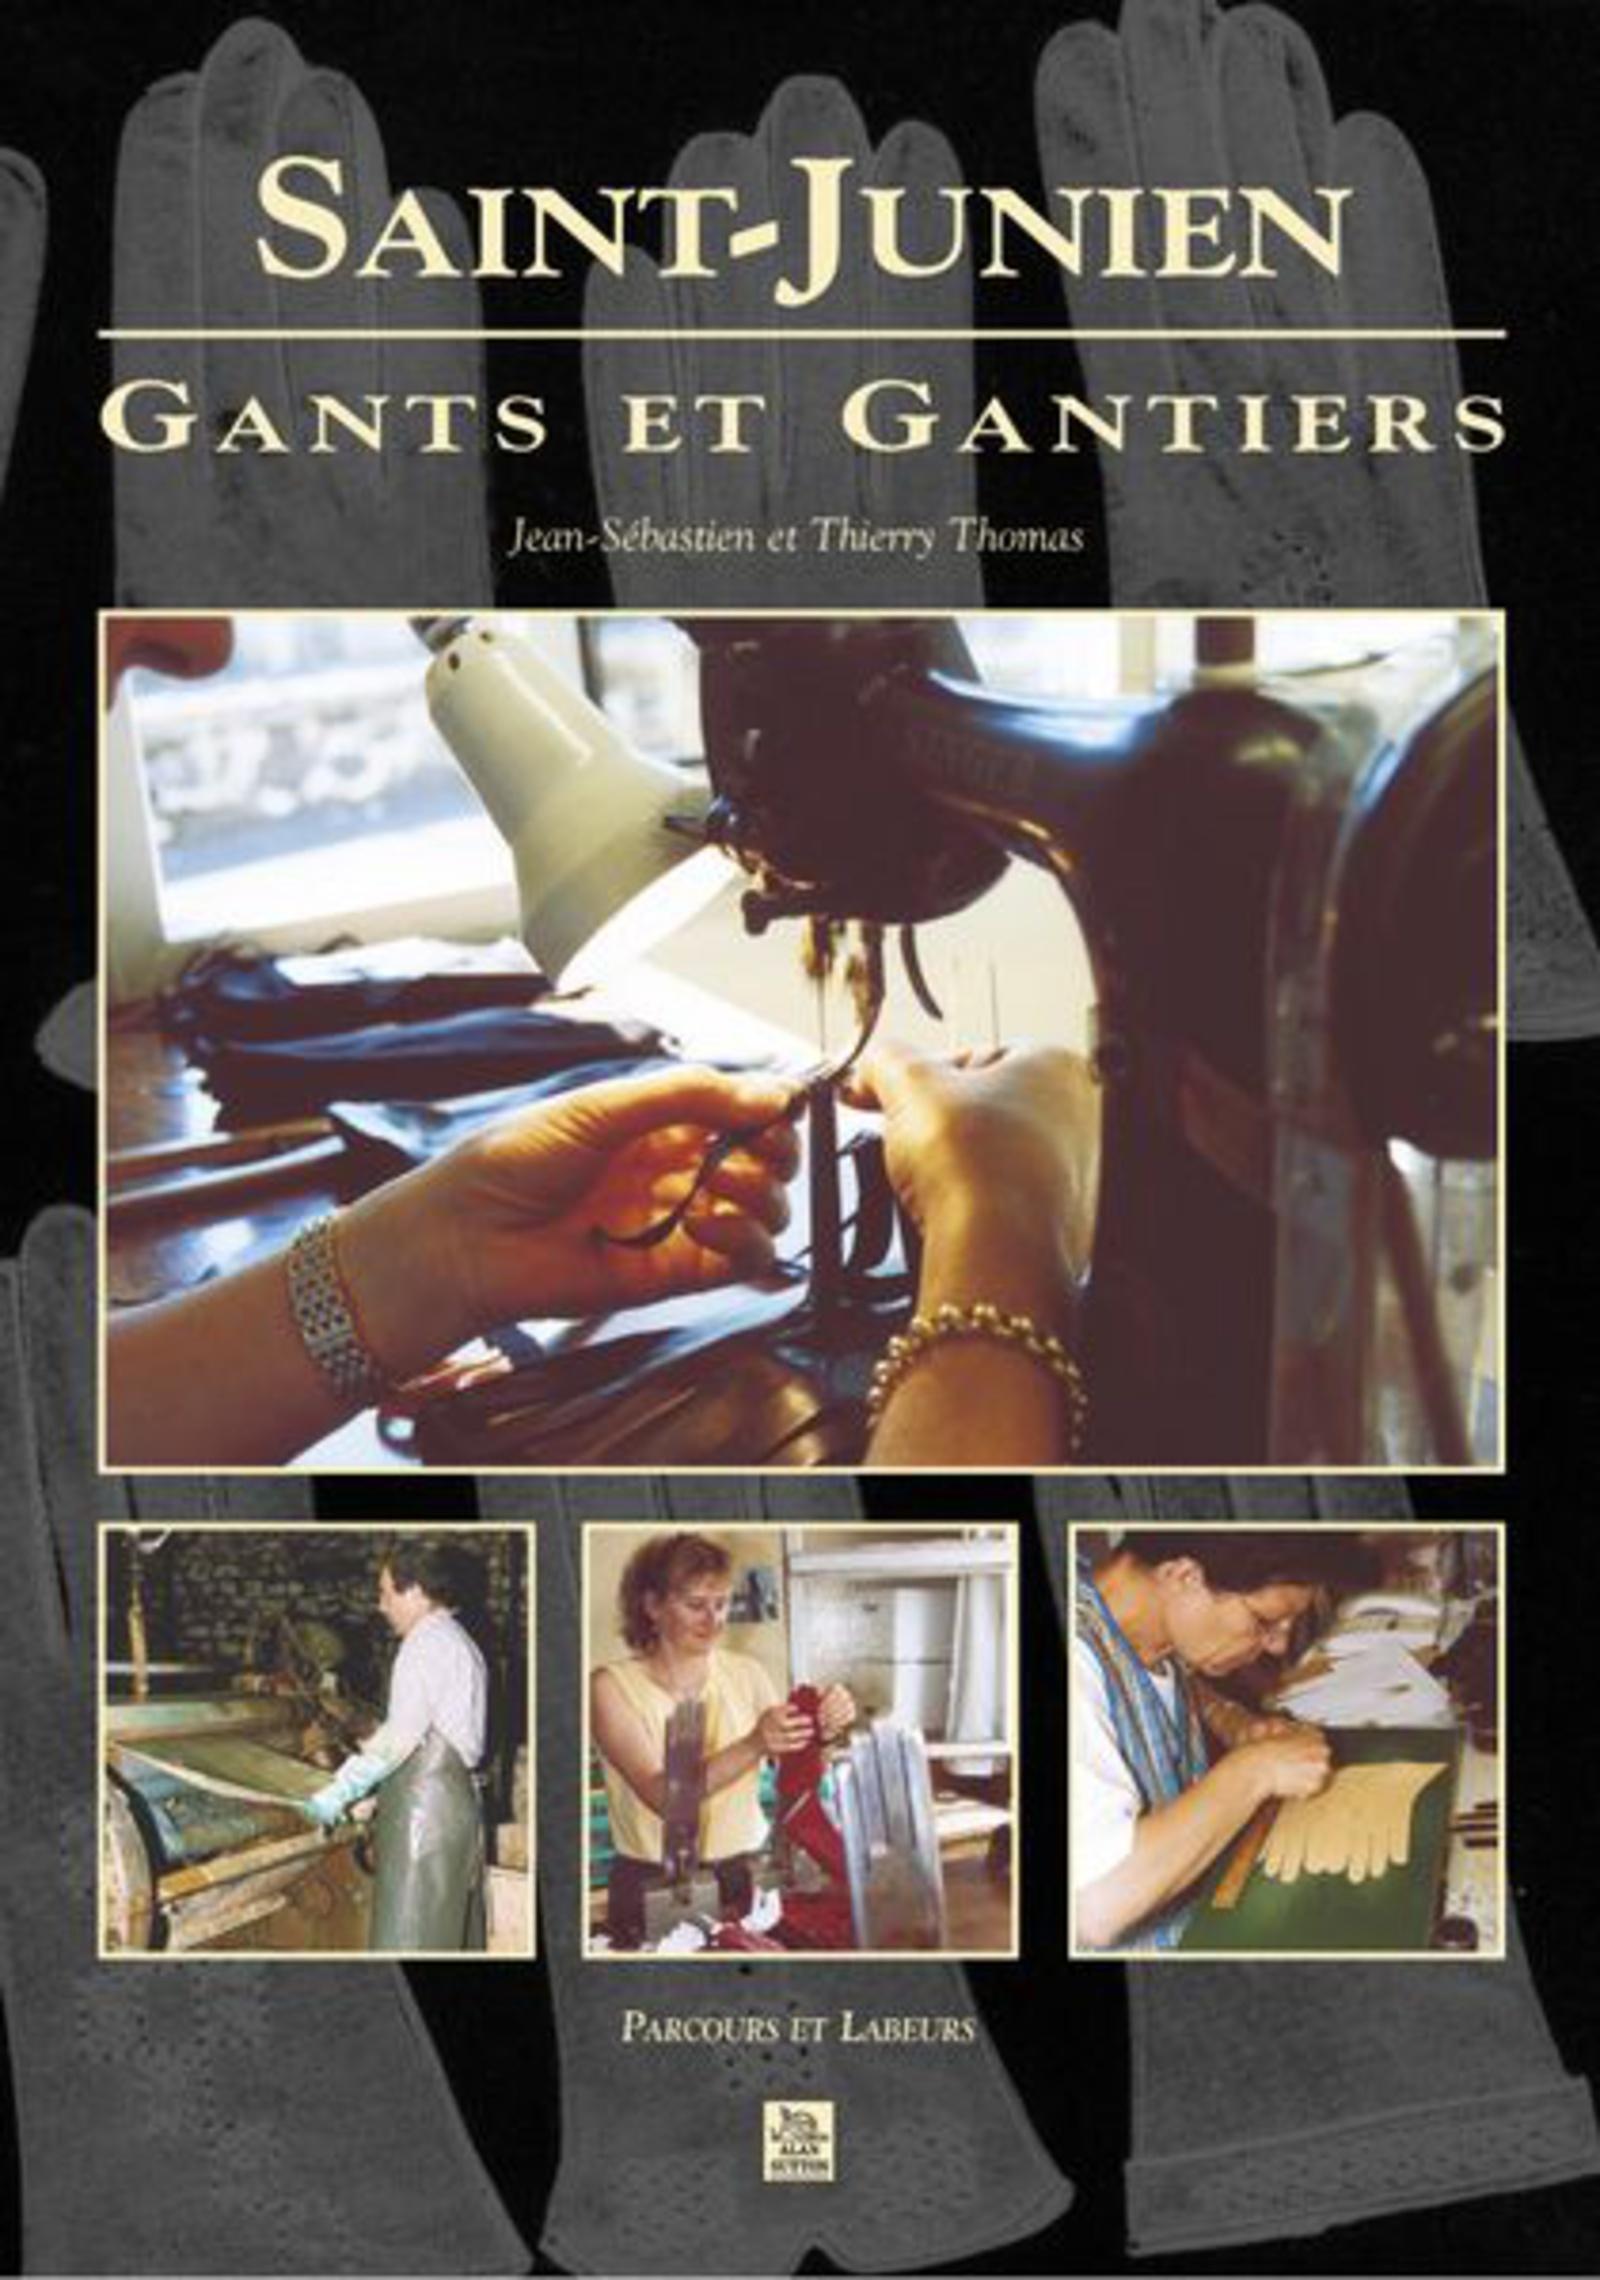 SAINT-JUNIEN - GANTS ET GANTIERS